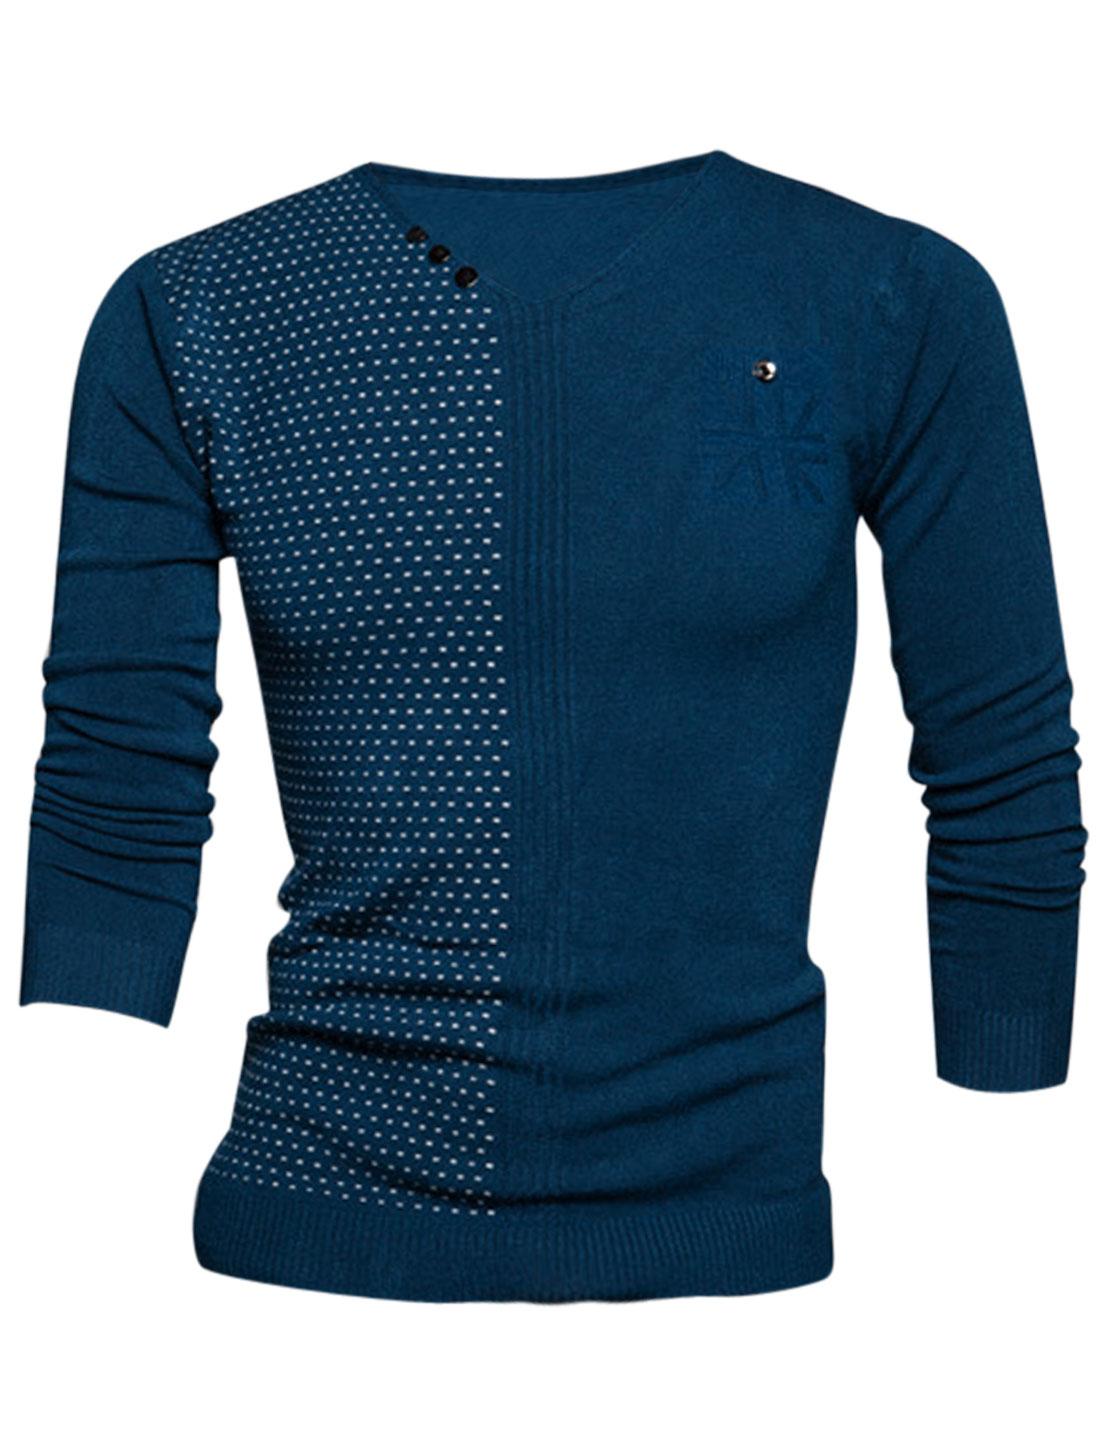 Men V Neck Novelty Prints Stitched Design Stylish Knit Shirt Navy Blue M